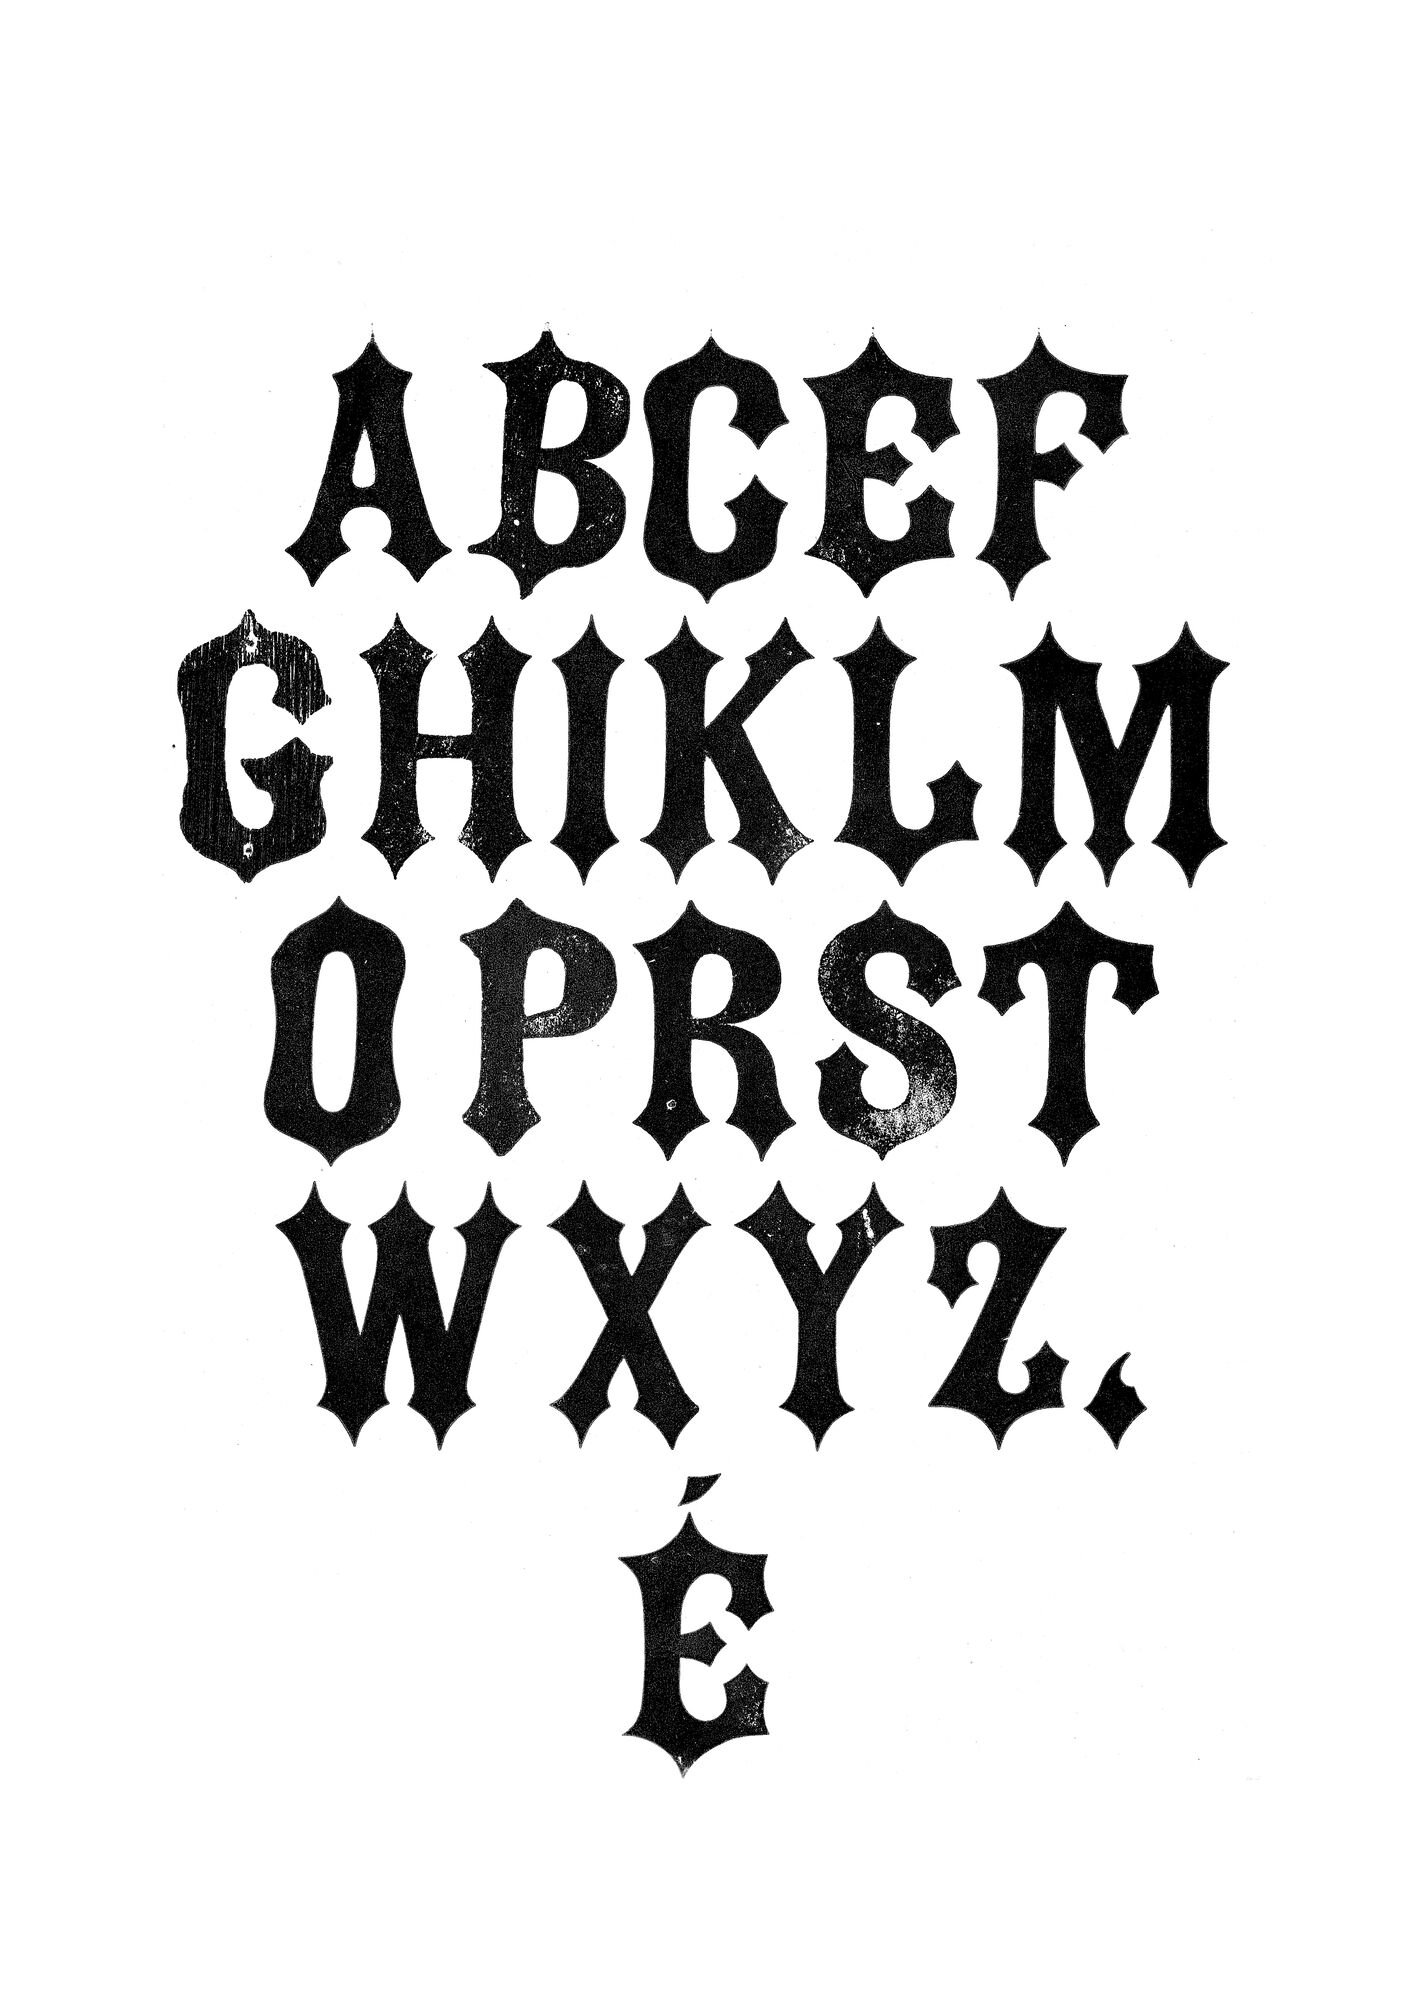 Houten drukletters van het type Gothic Tuscan Pointed